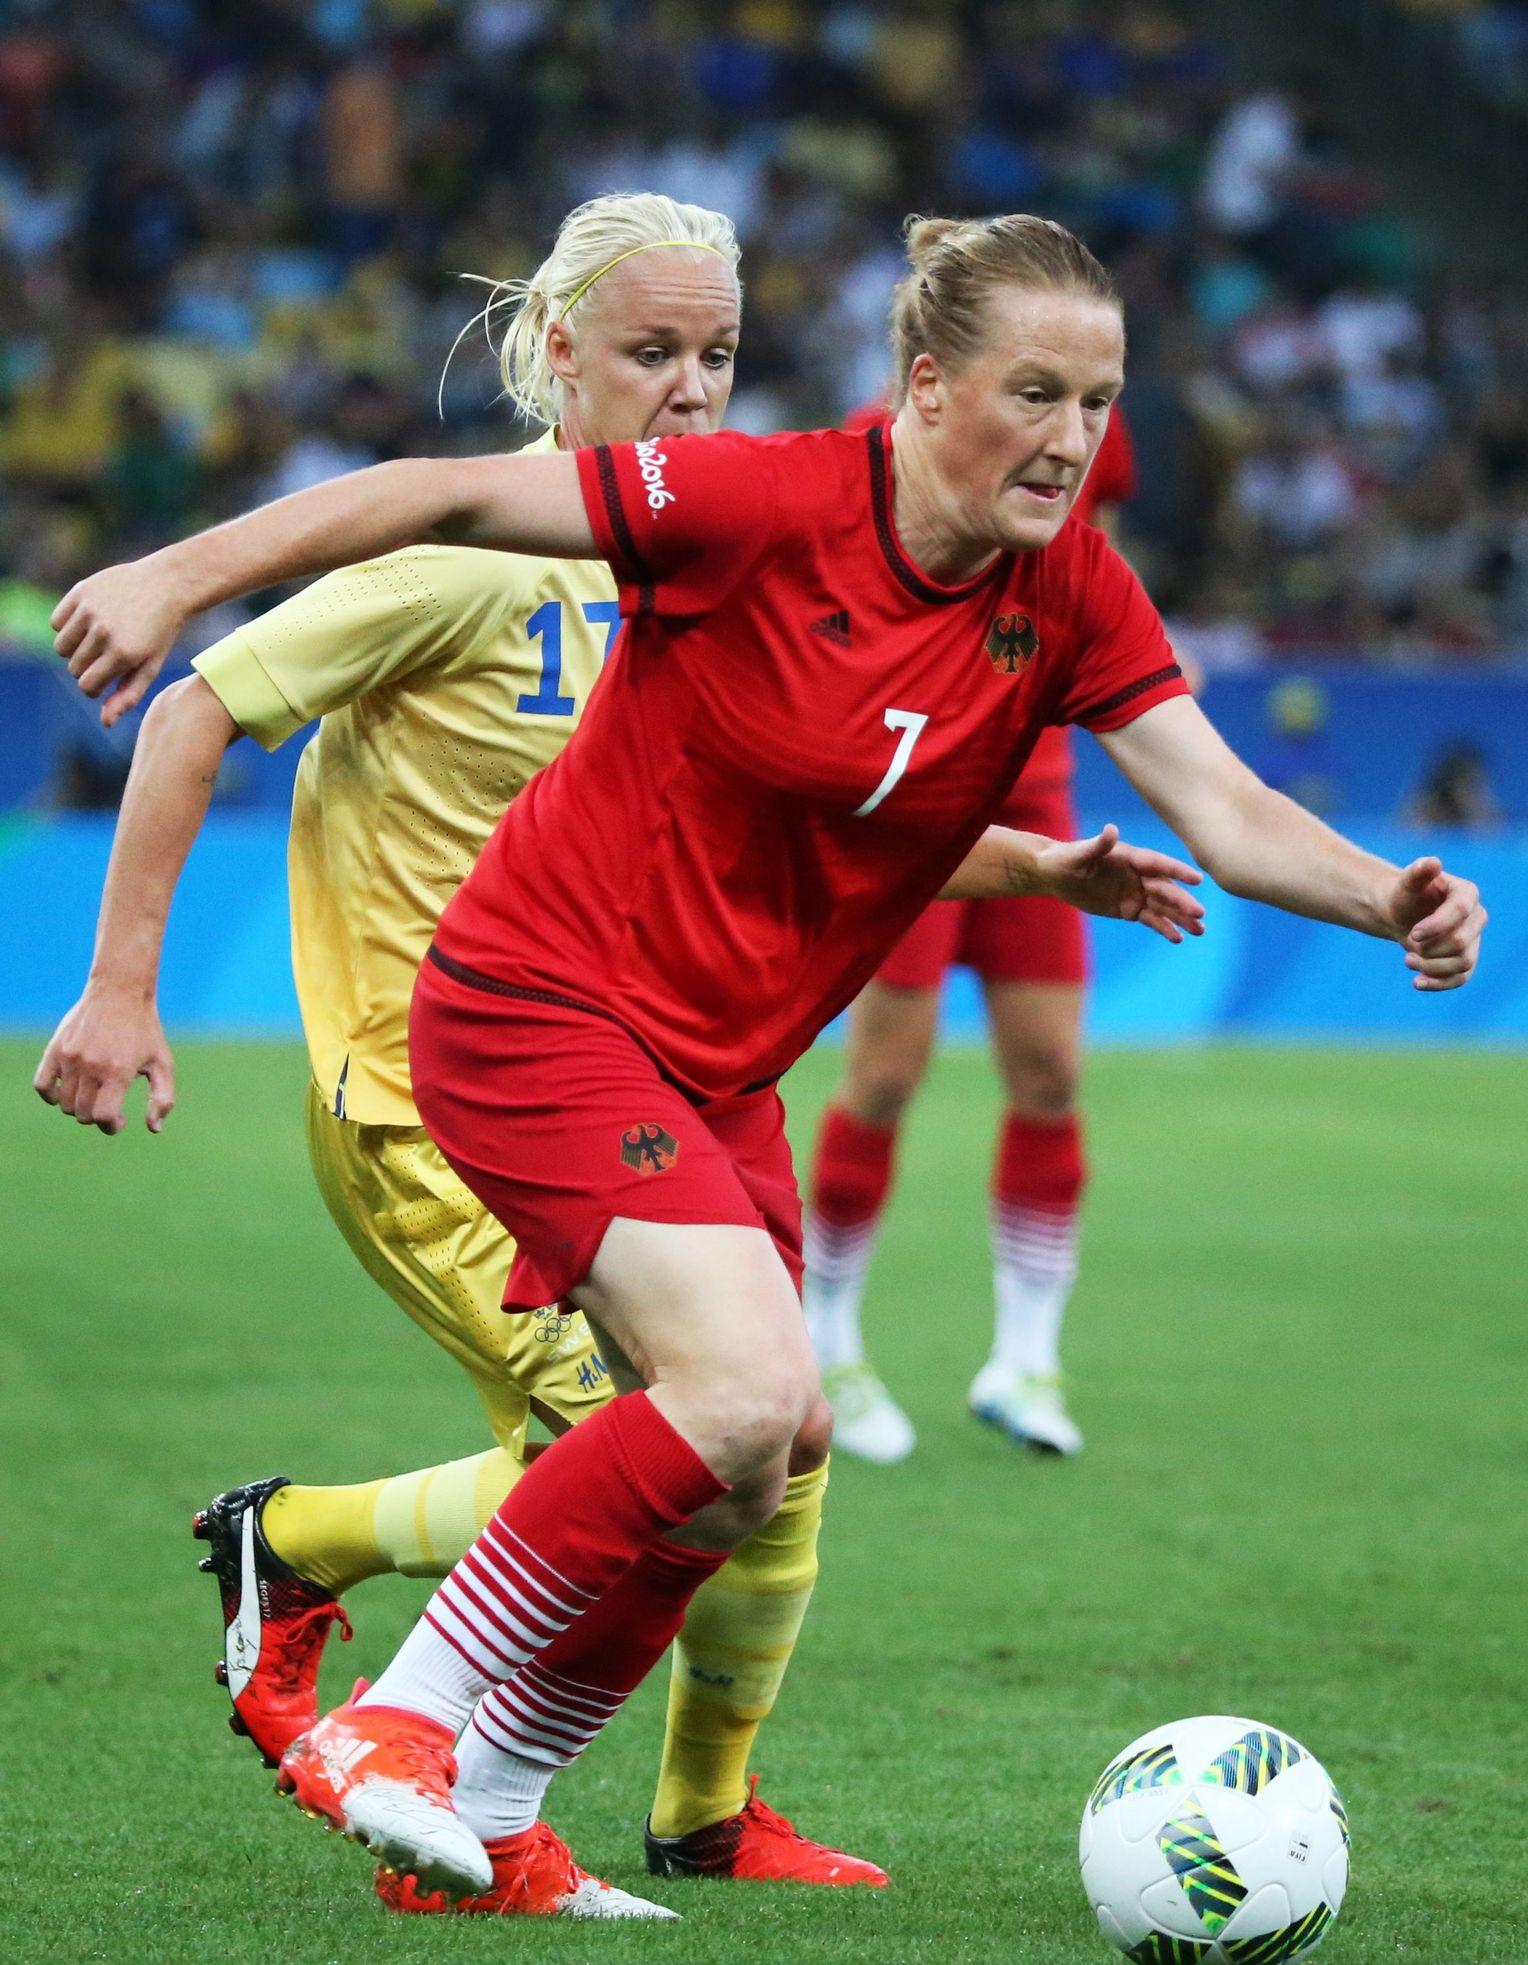 Olympia Damenfussball